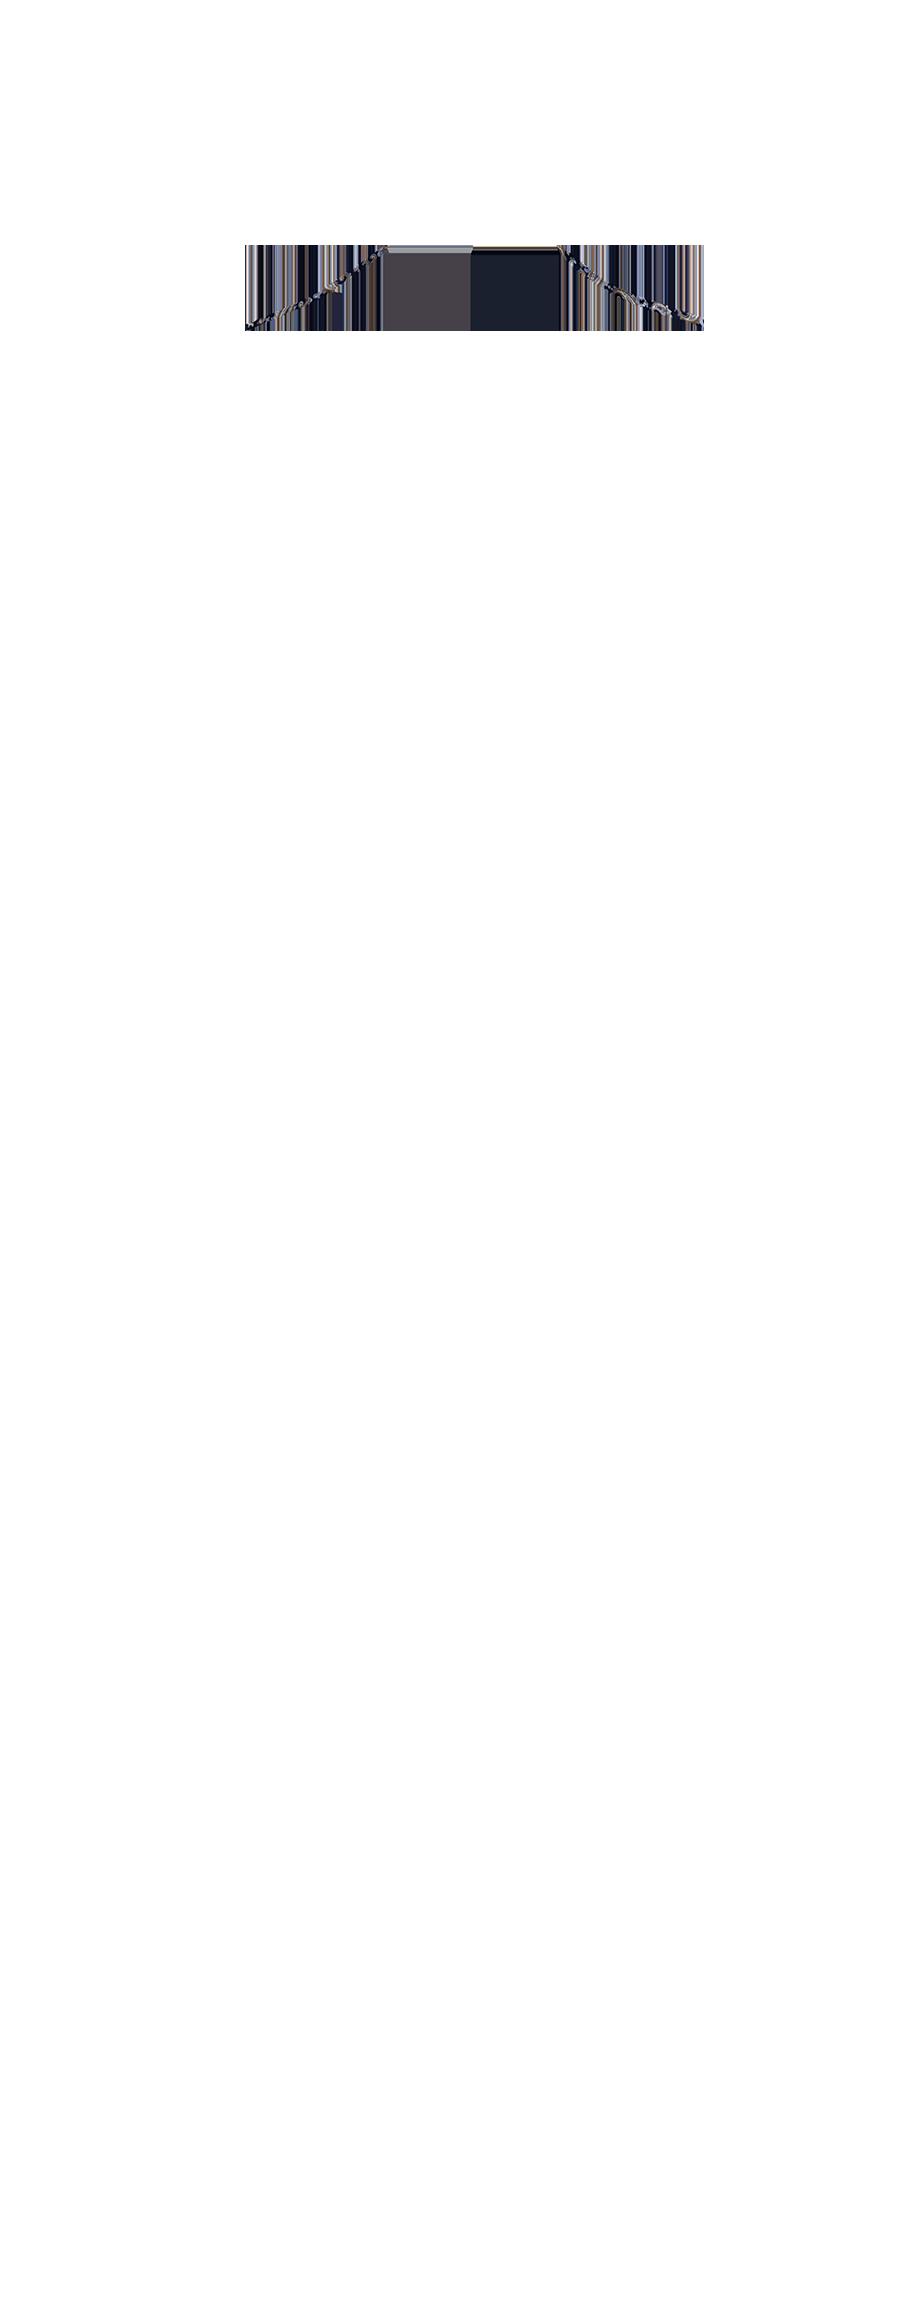 NEFL-20